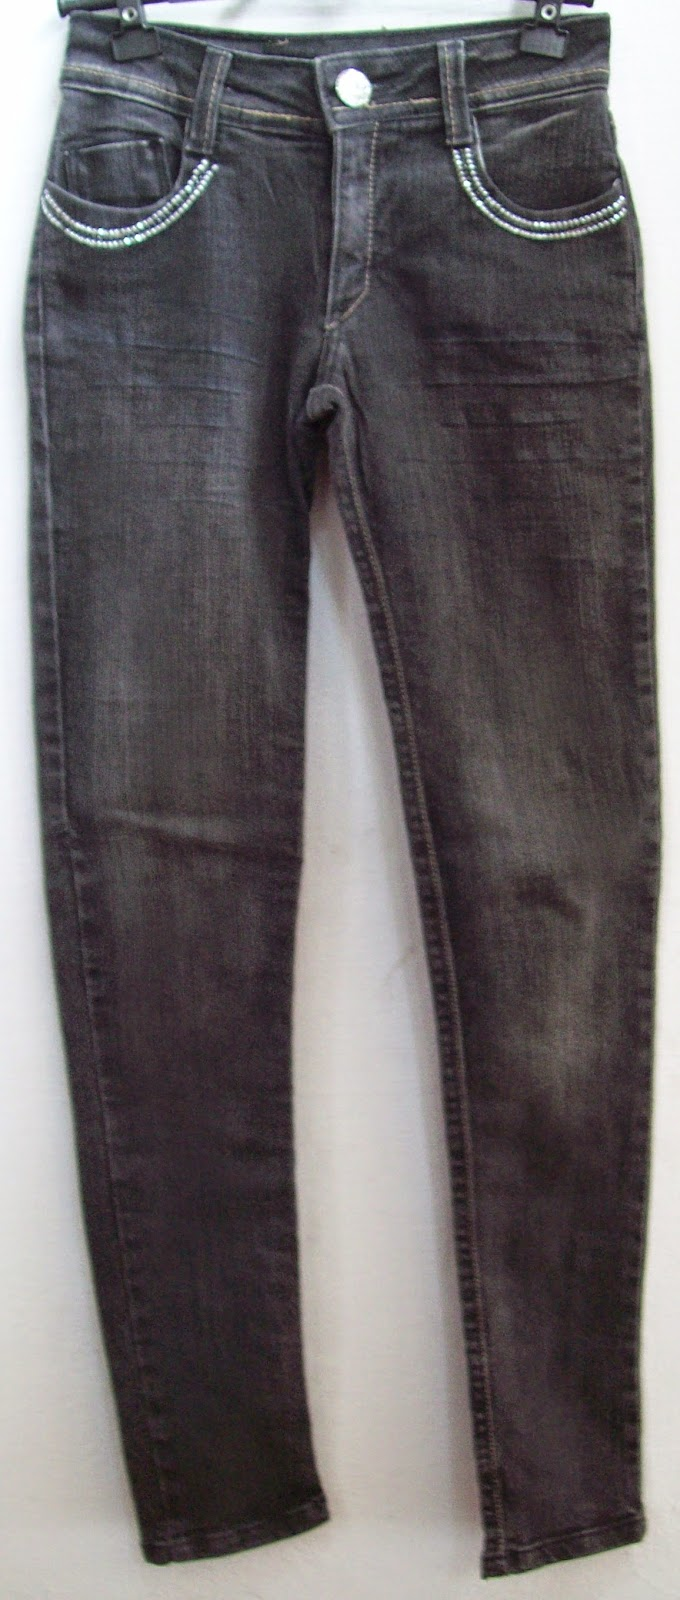 calça jeans Jezzian tamanho 36